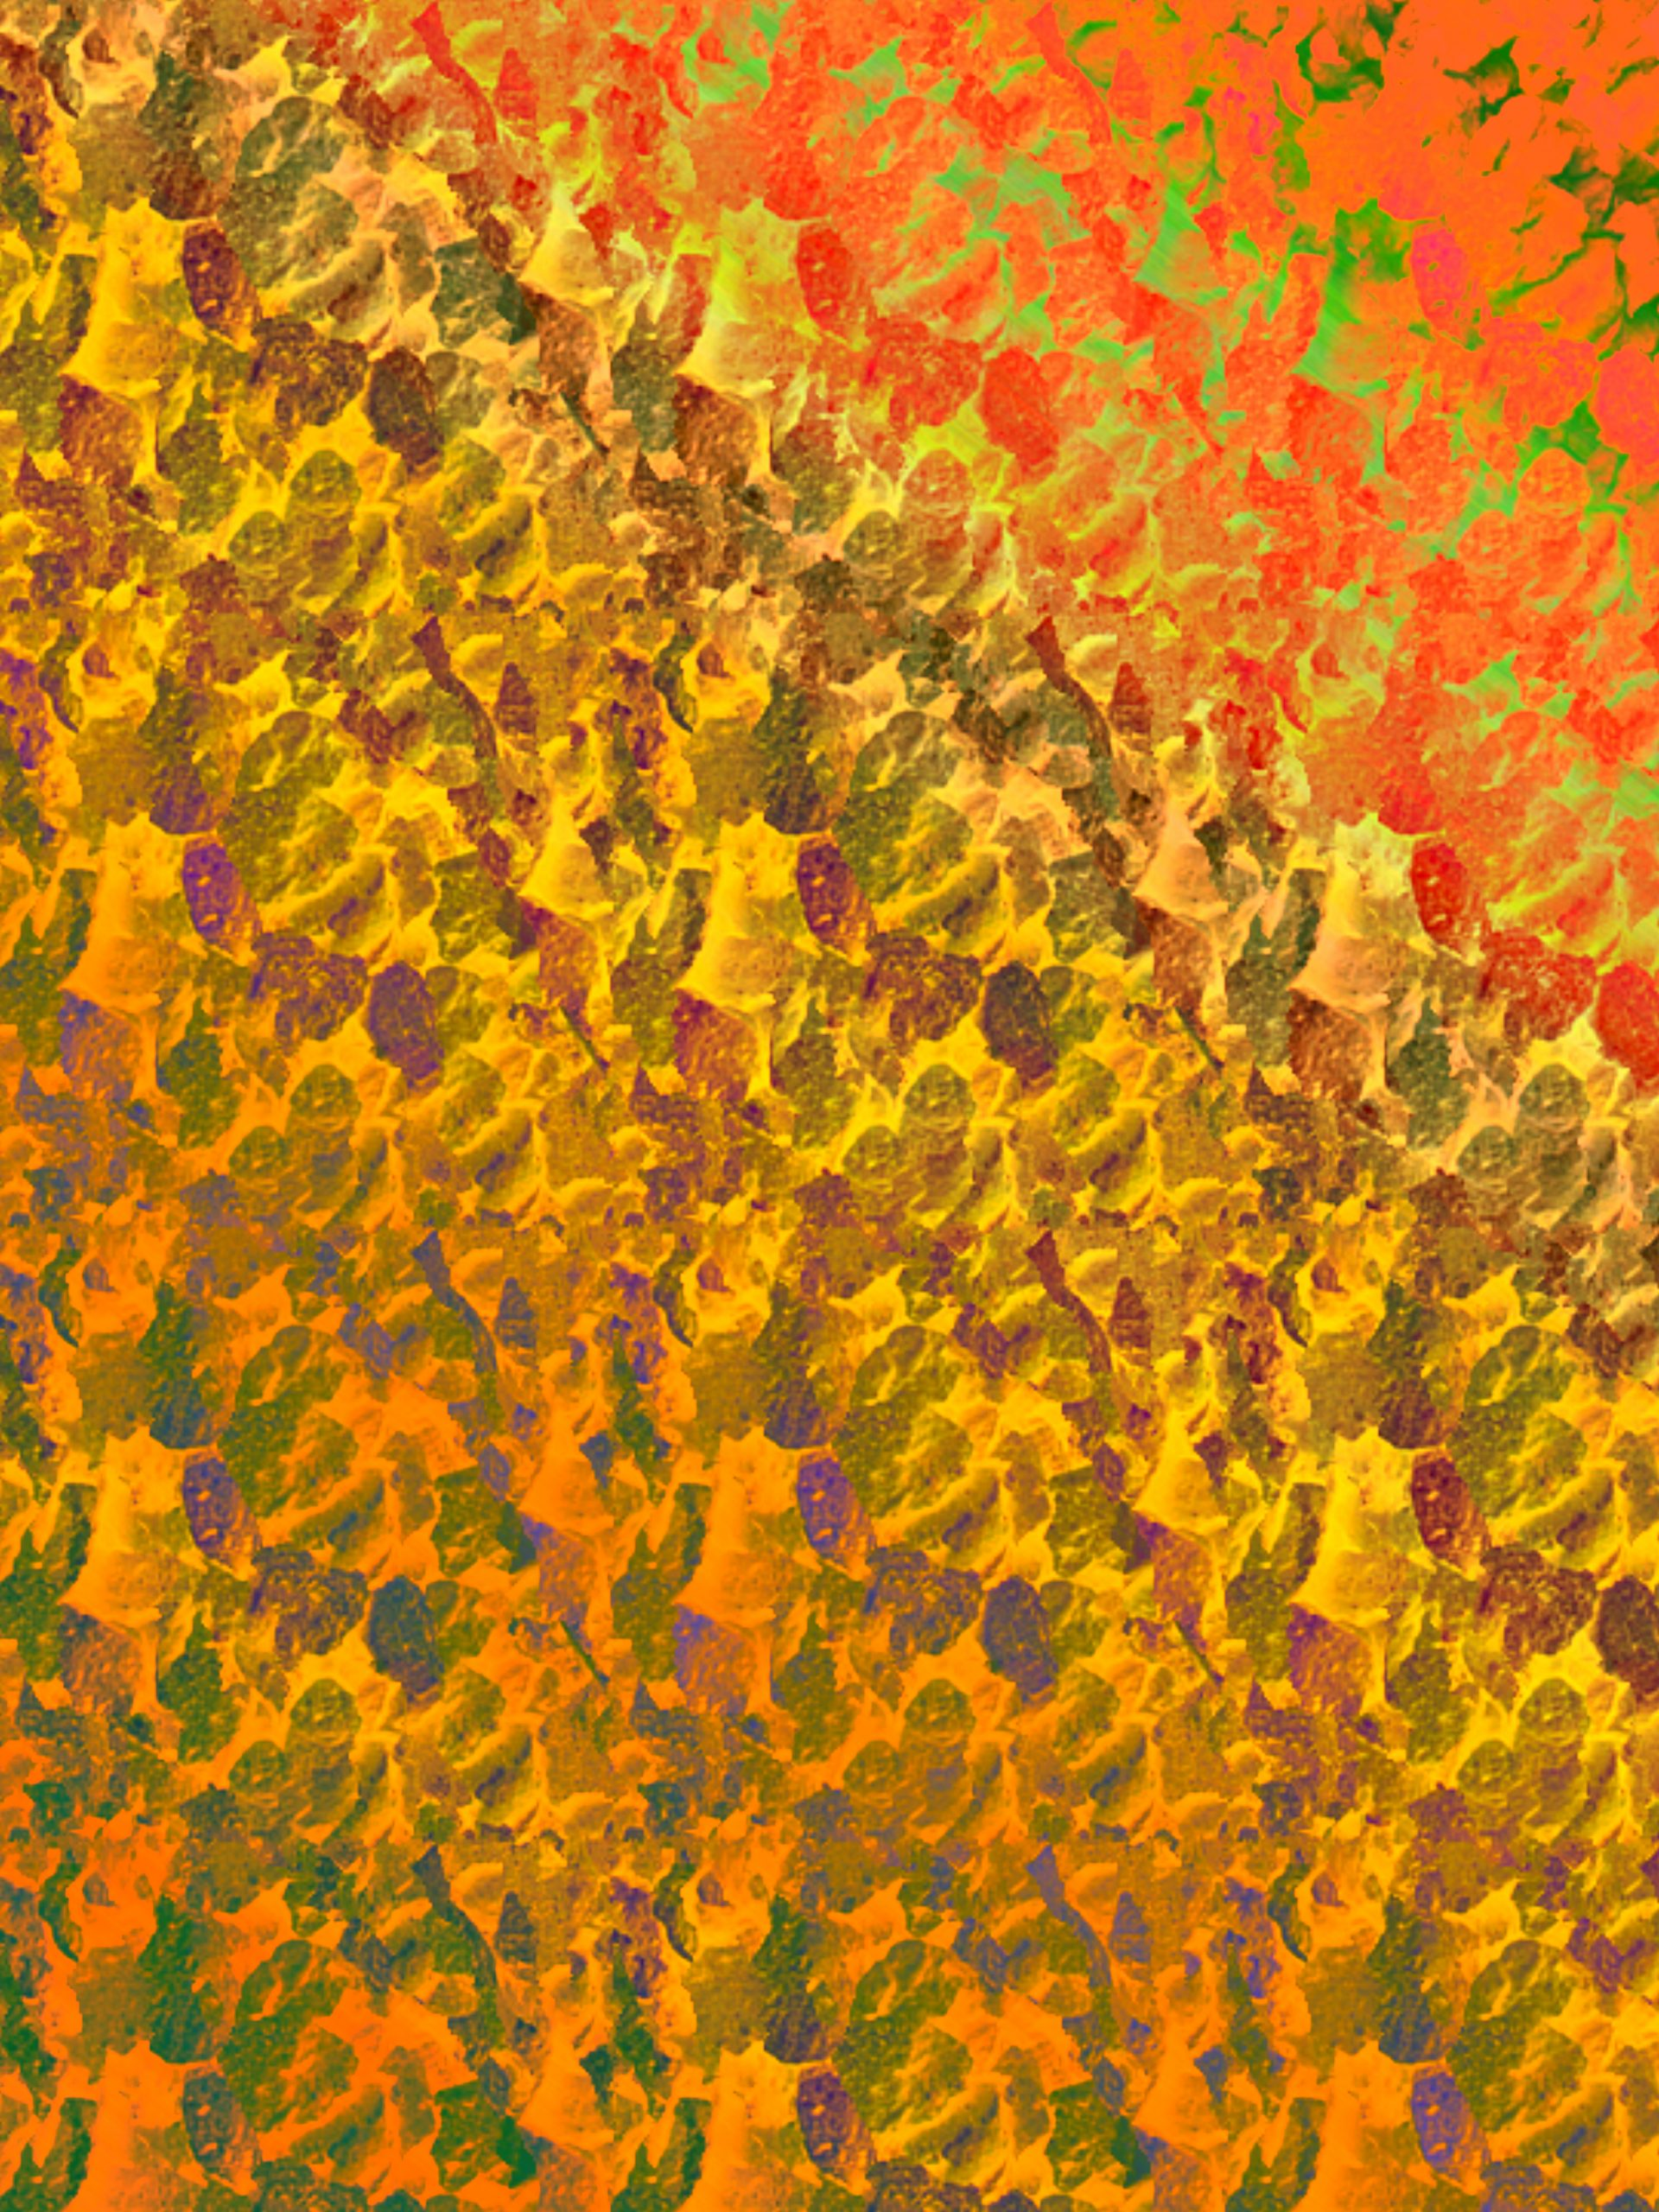 Fiery orange design illustration